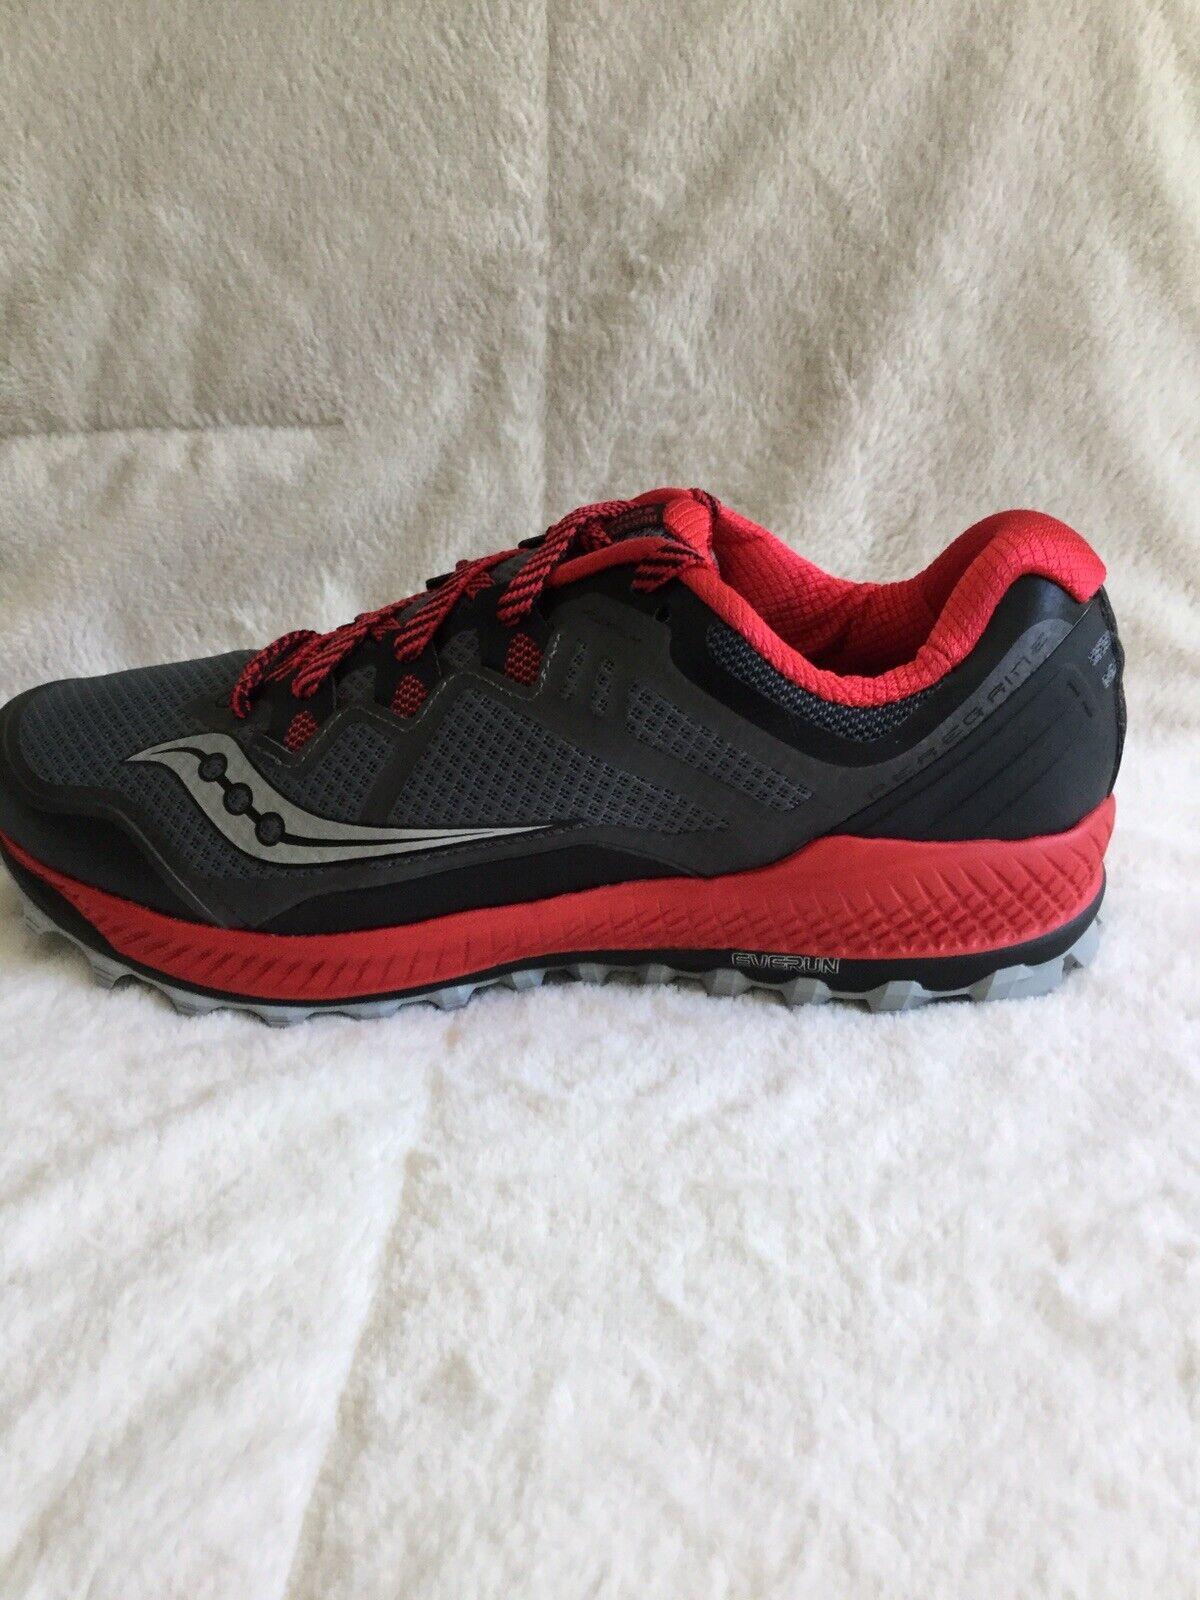 Saucony Peregrine 8 S20424-4 Para Hombre Trail Running Zapatos Negro Rojo Tamaño 10.5